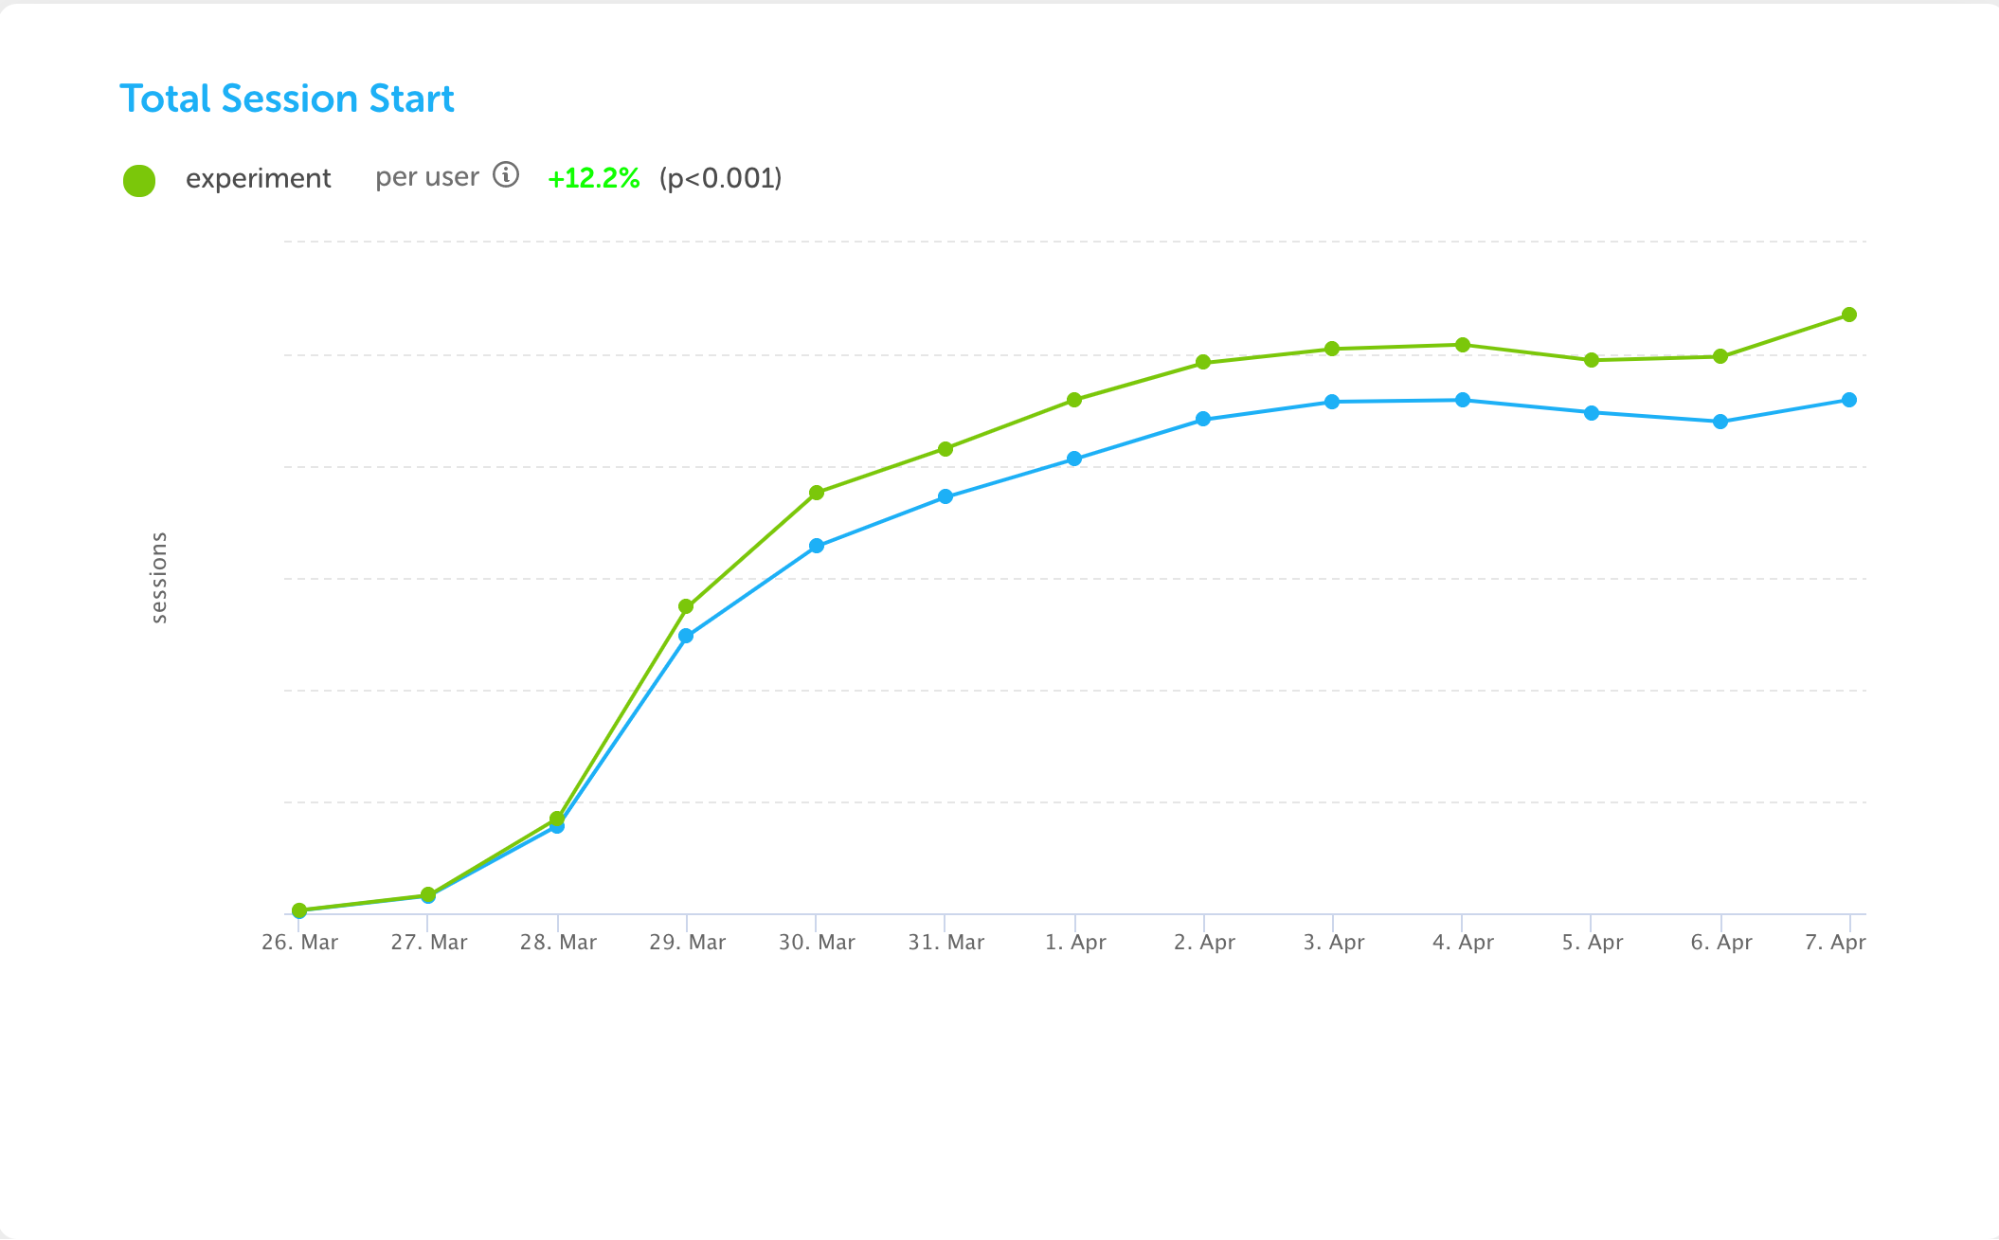 Session start graph